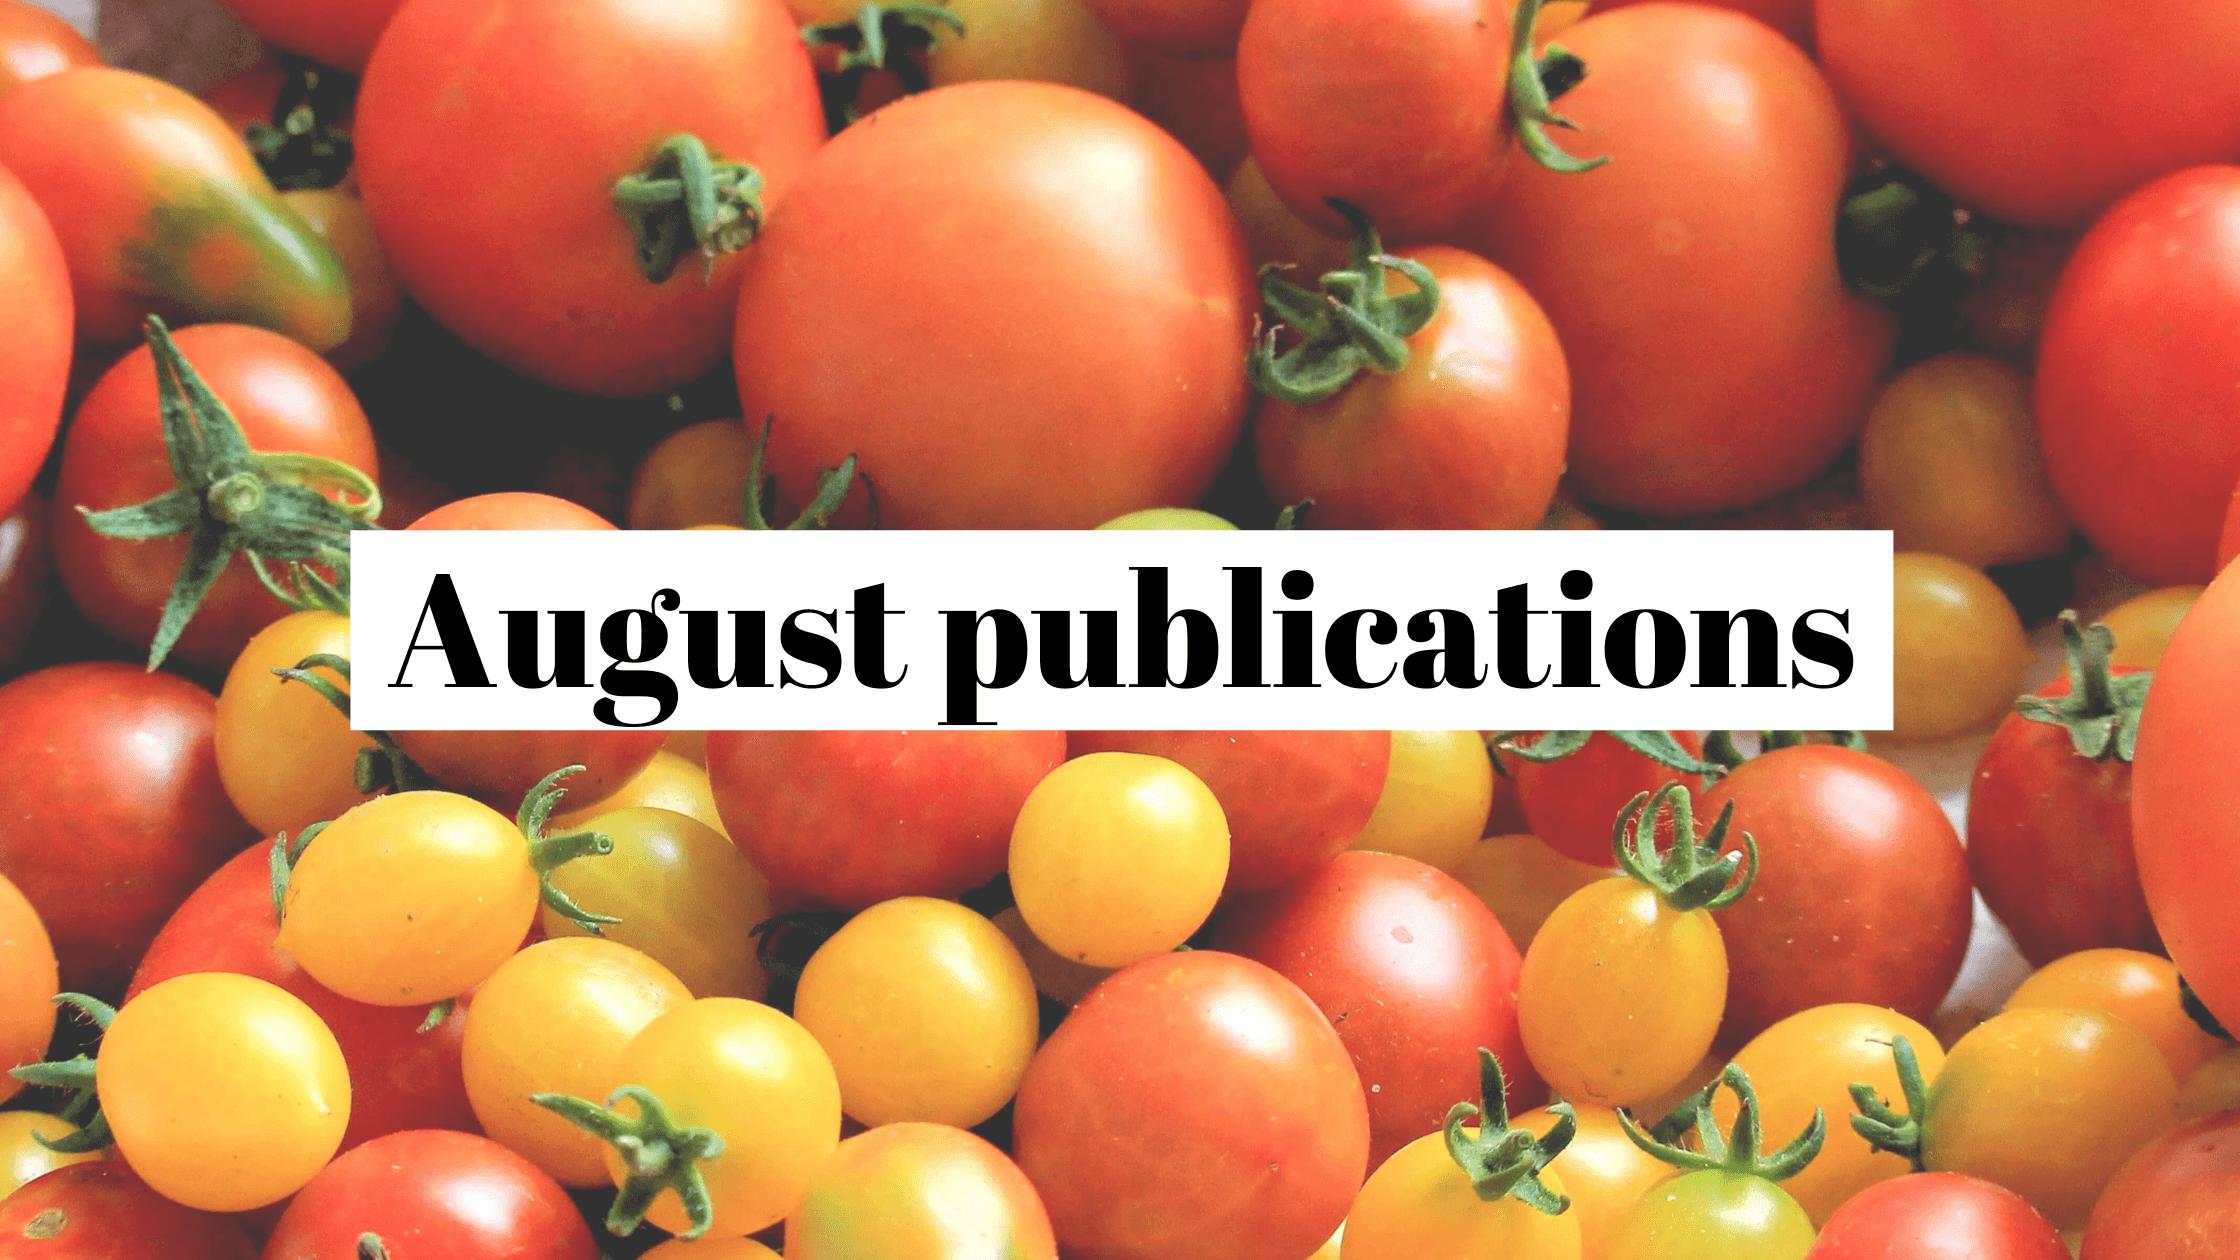 Truesix's August 2021: publications in Inc., Fast Company, Yahoo Finance & more